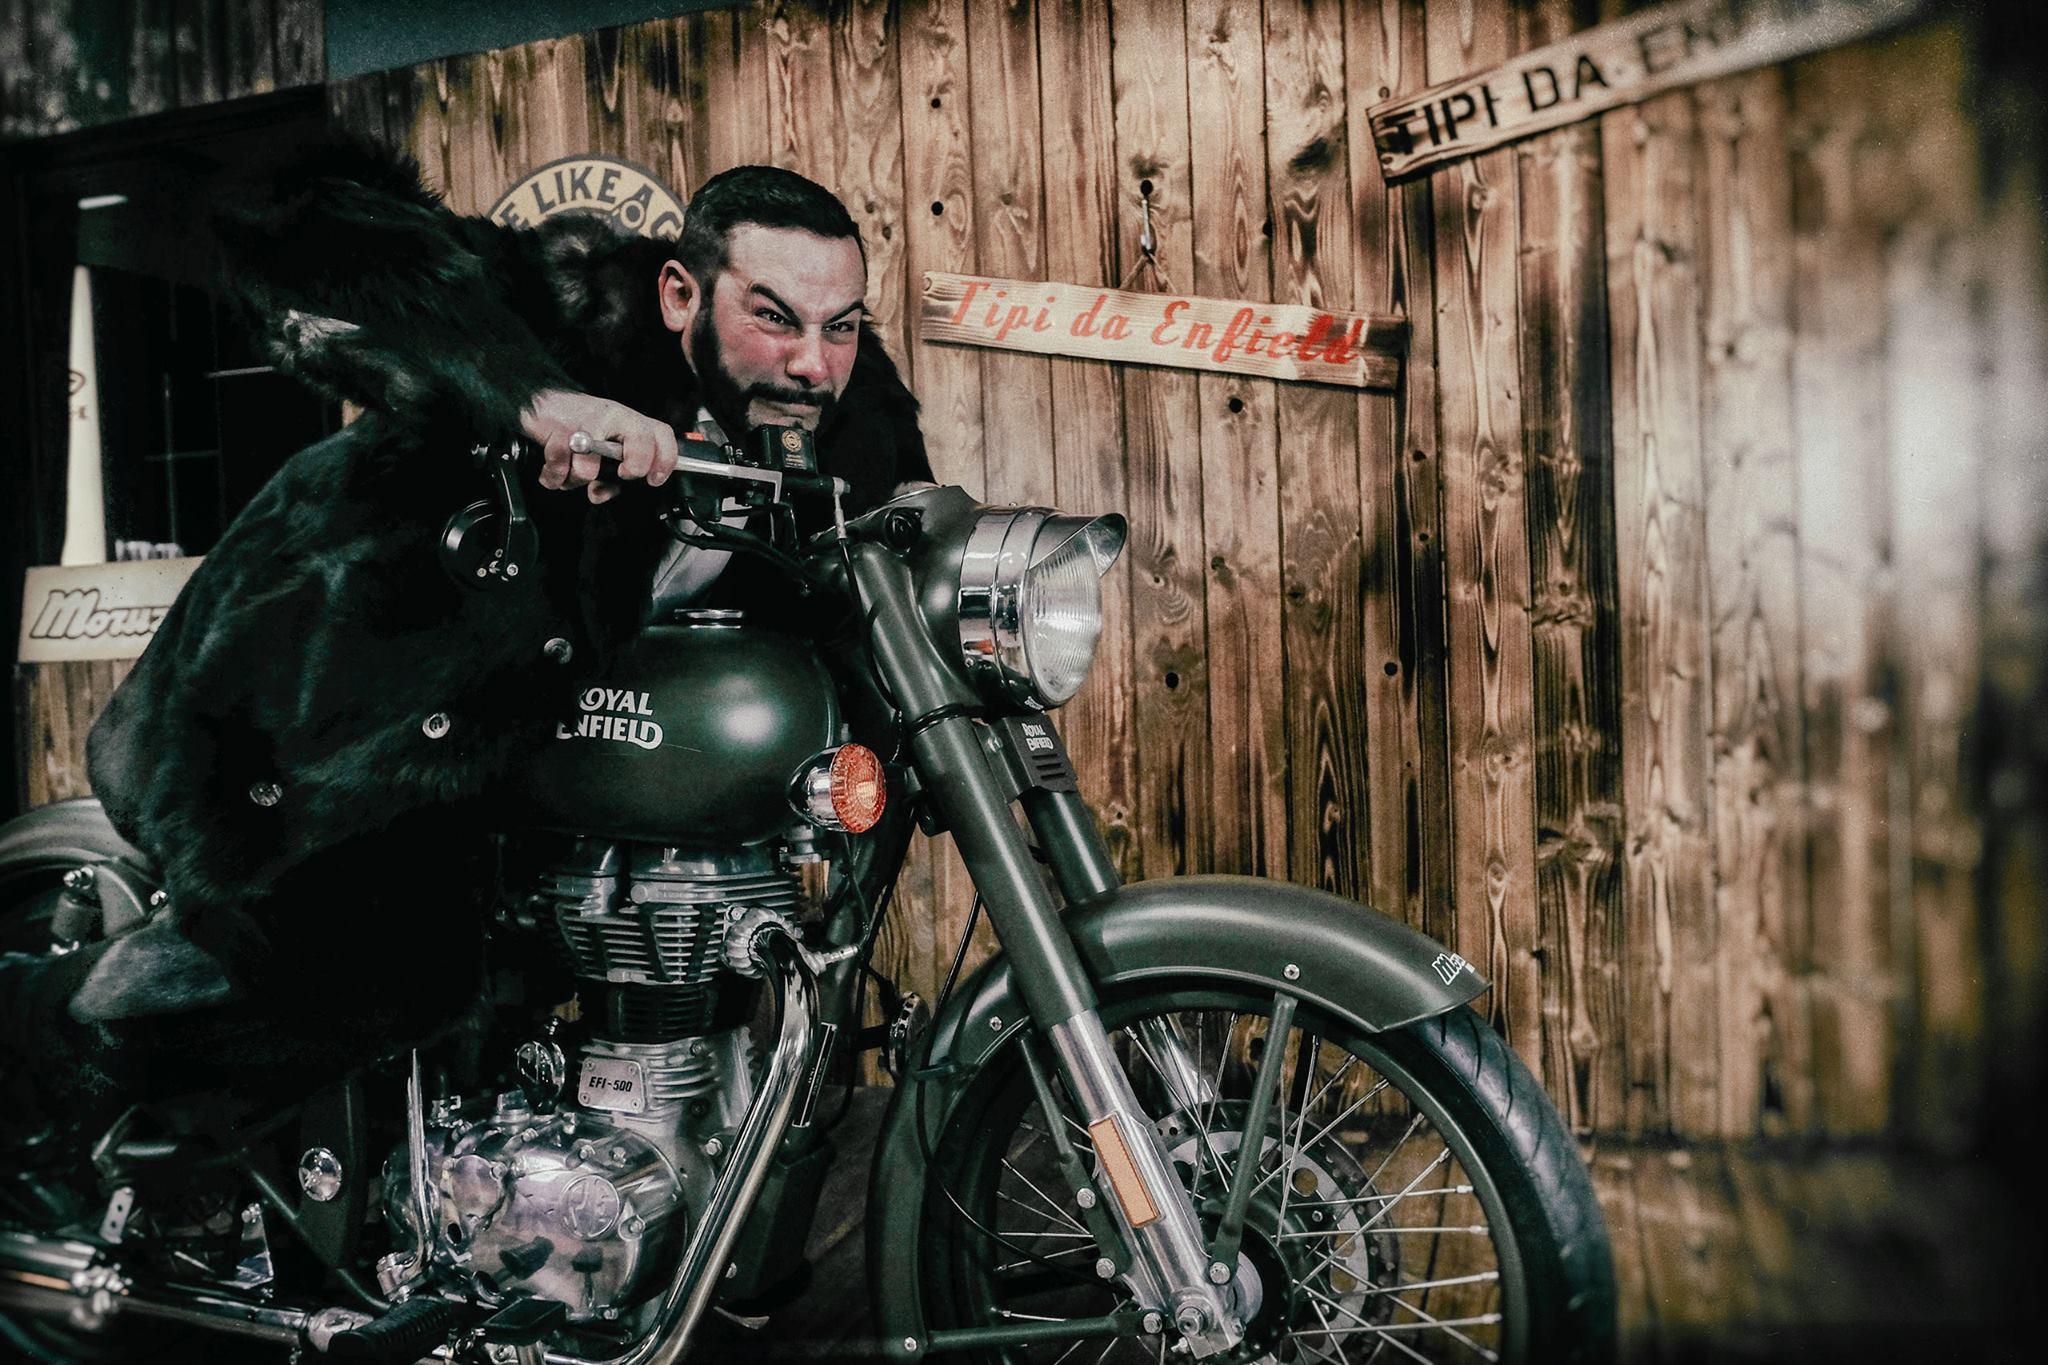 royal-enfield-piacenza-moruzzi-moto-wonderland-campagna-promo-3